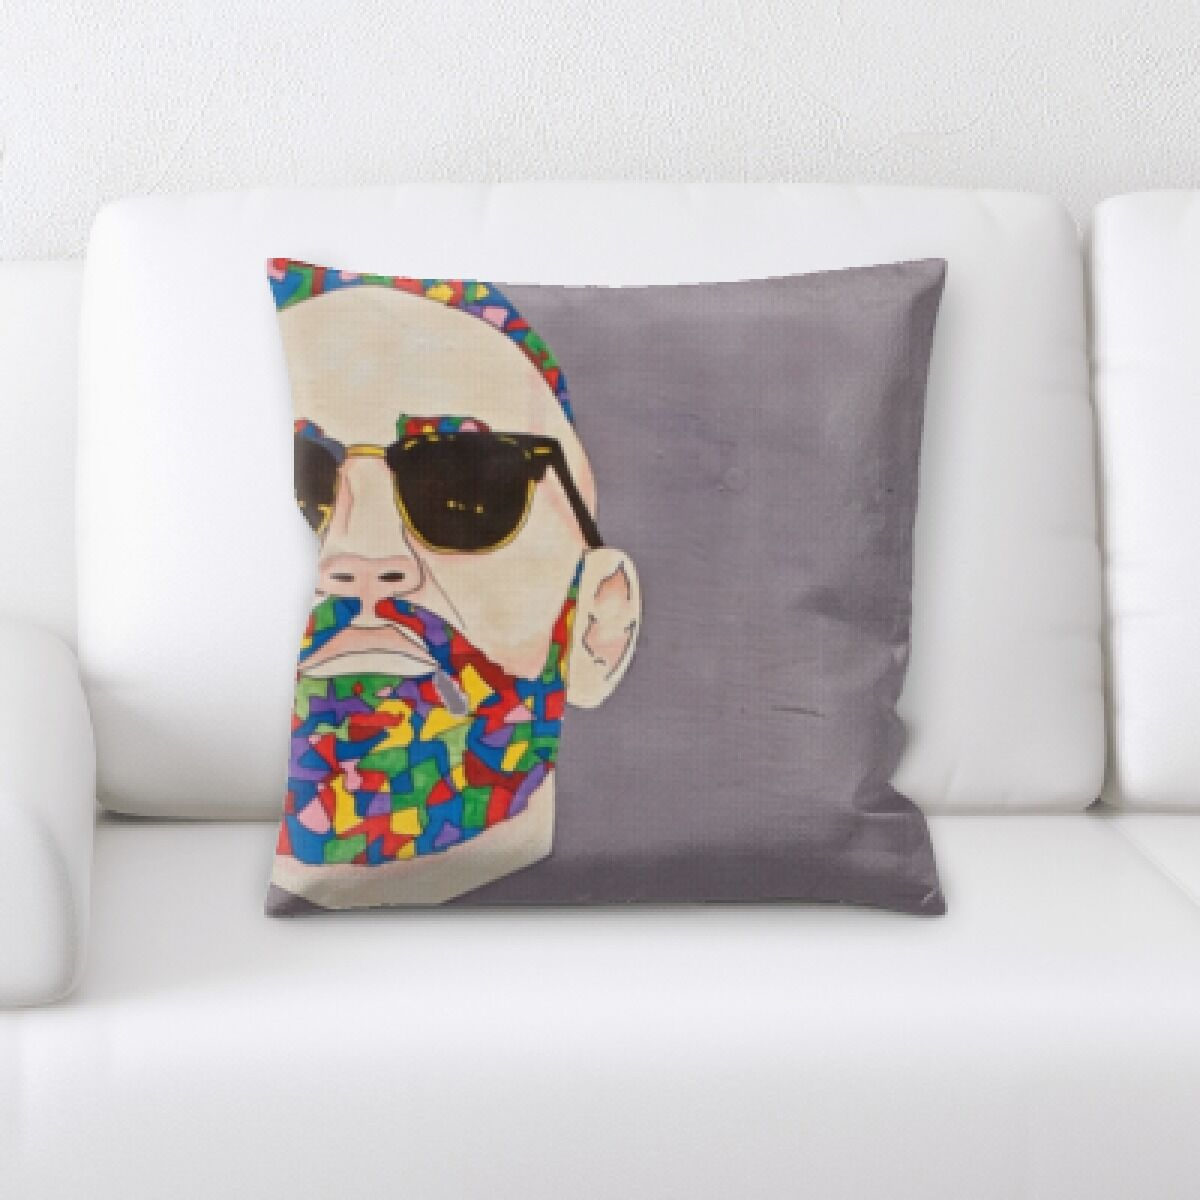 Woen Man with Sun Glasses Throw Pillow